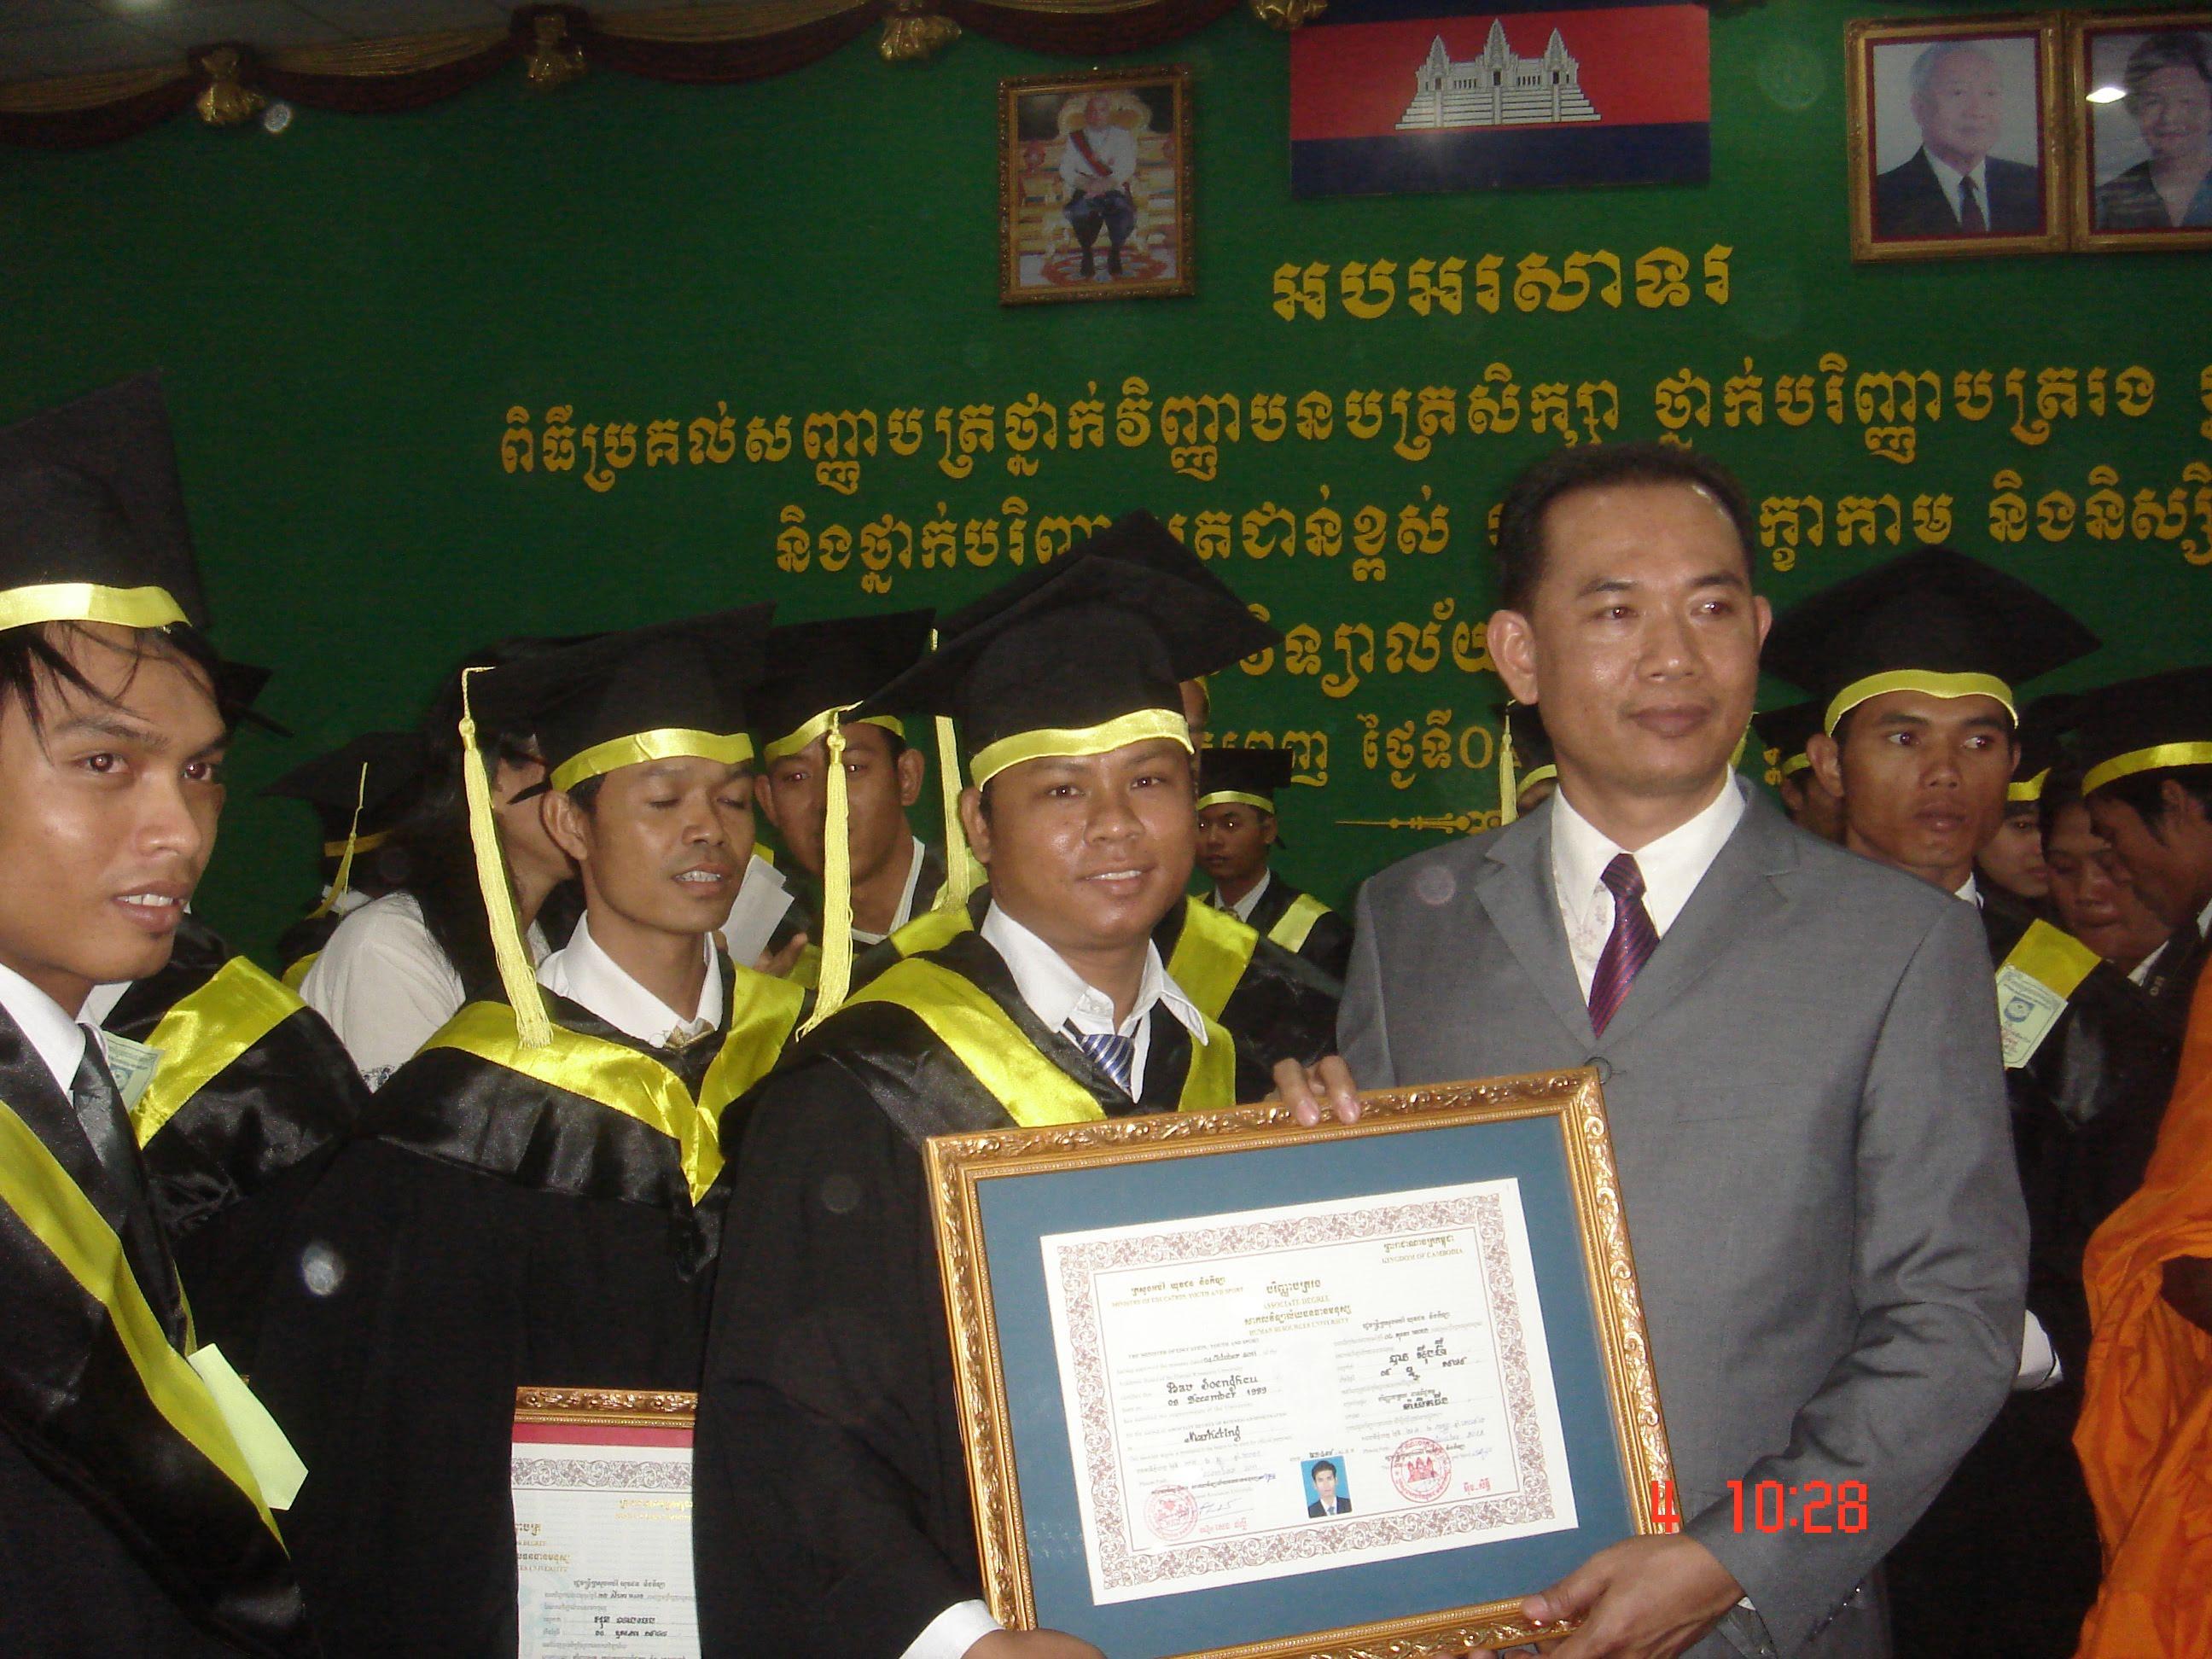 Chenda_remise de diplôme